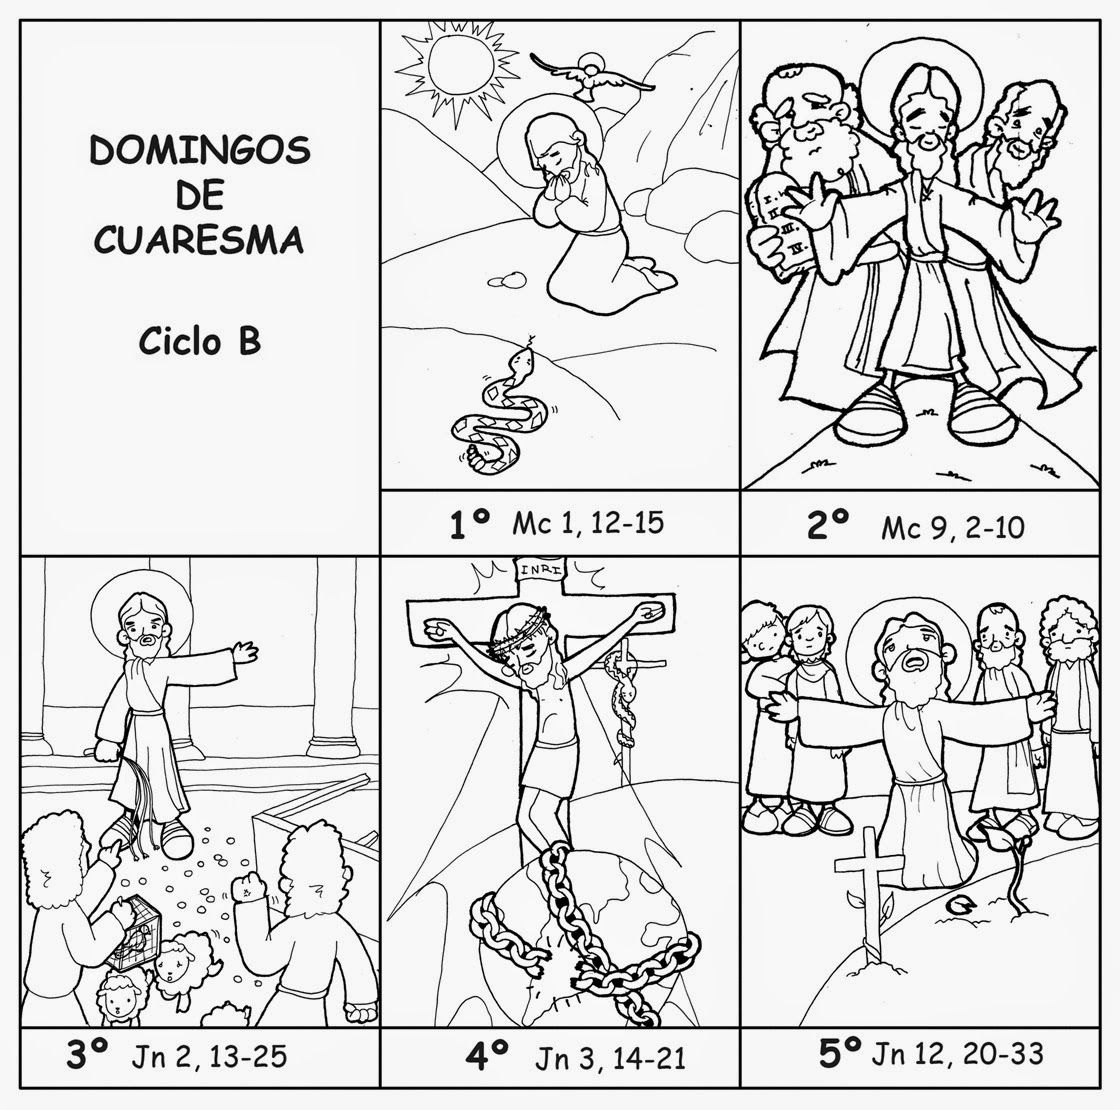 Dibujos para catequesis: DOMINGOS CUARESMA - Ciclo B | Religión ...